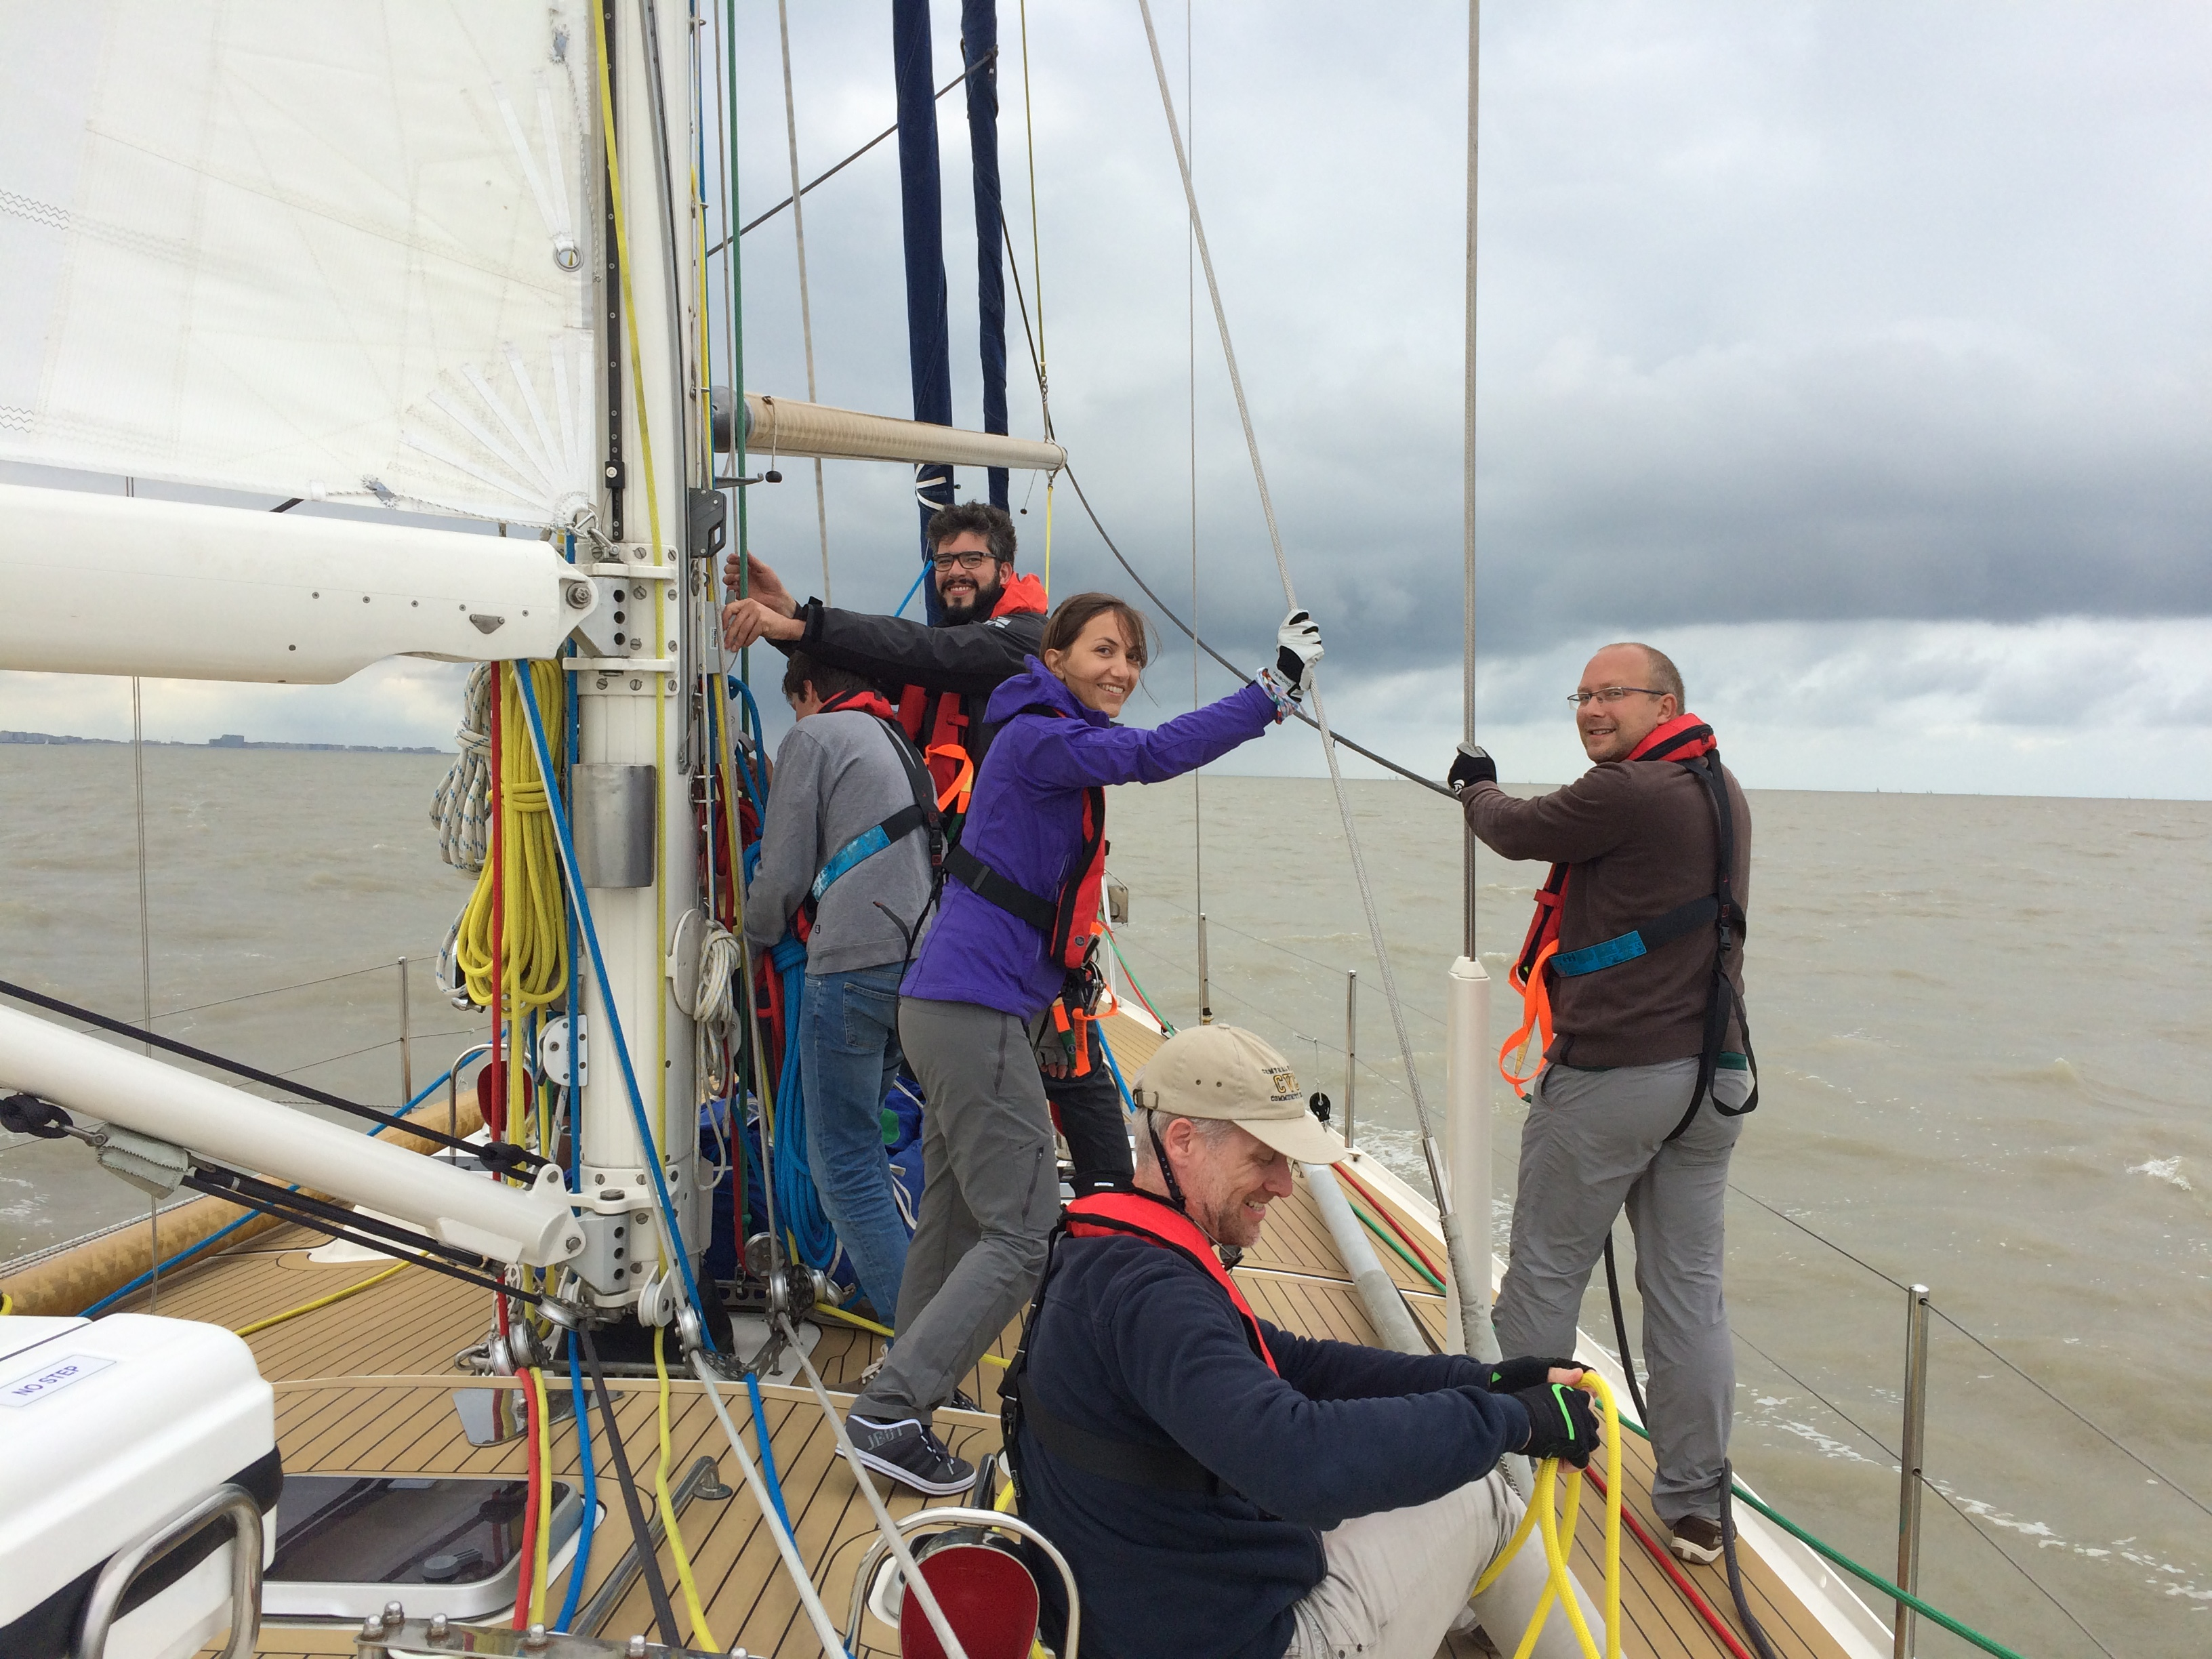 Sailinglesson